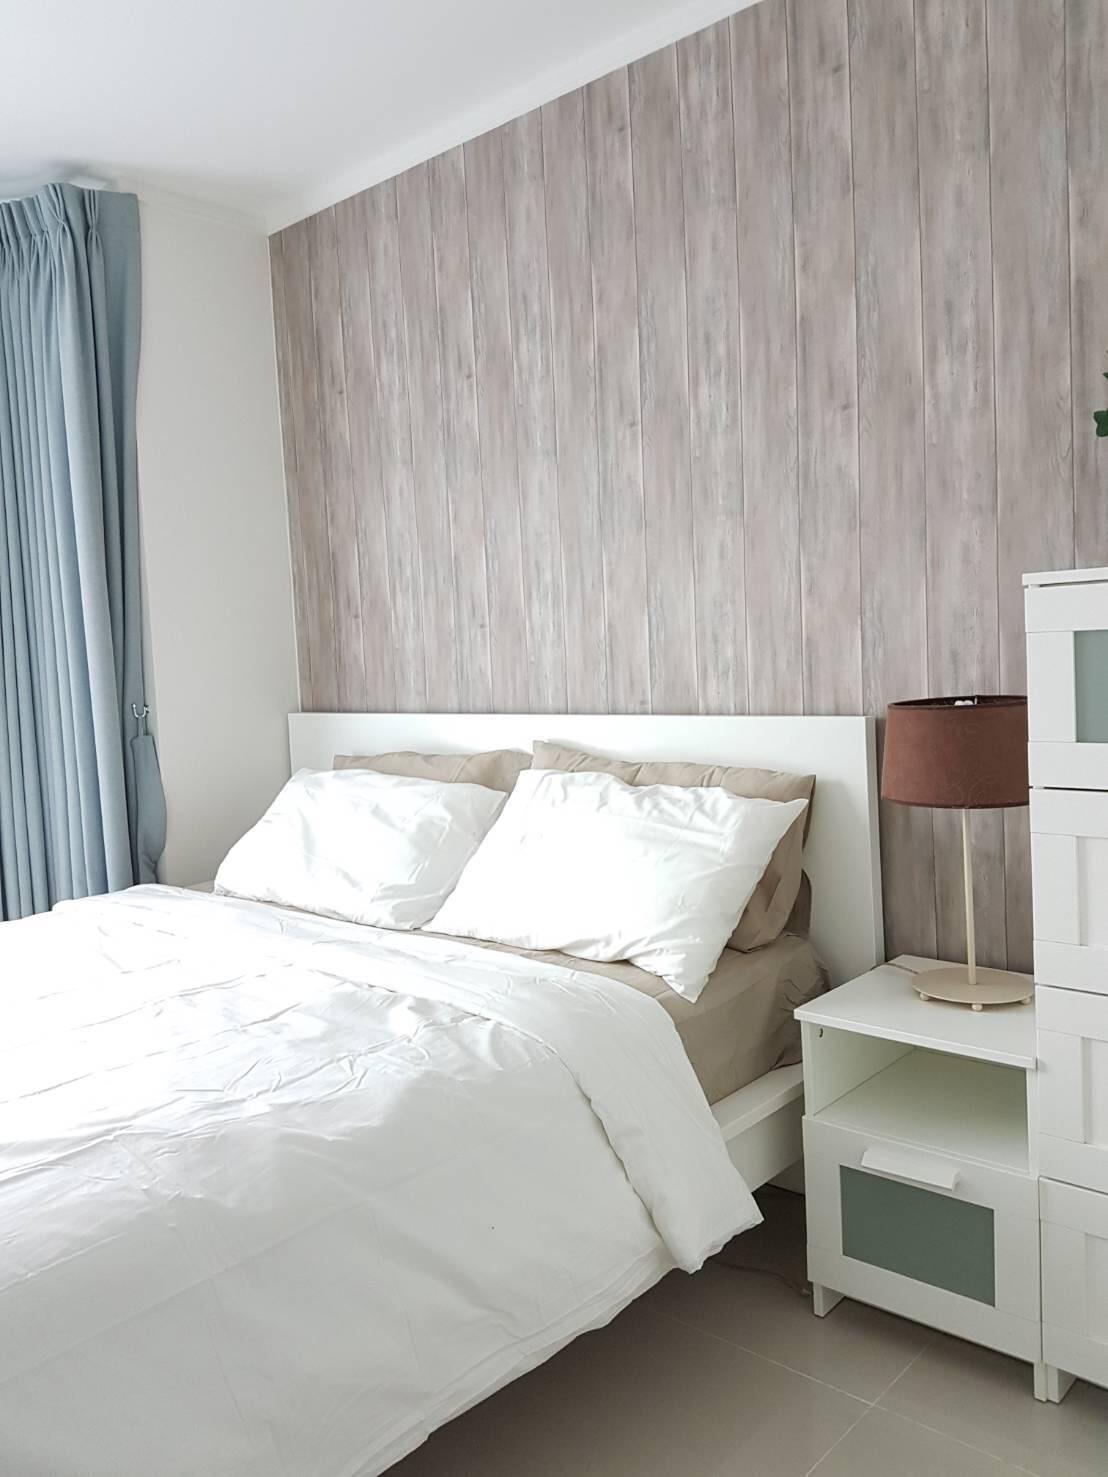 Lumpini Park Beach Jomtien 2 bedroom condo in Pattaya for rent